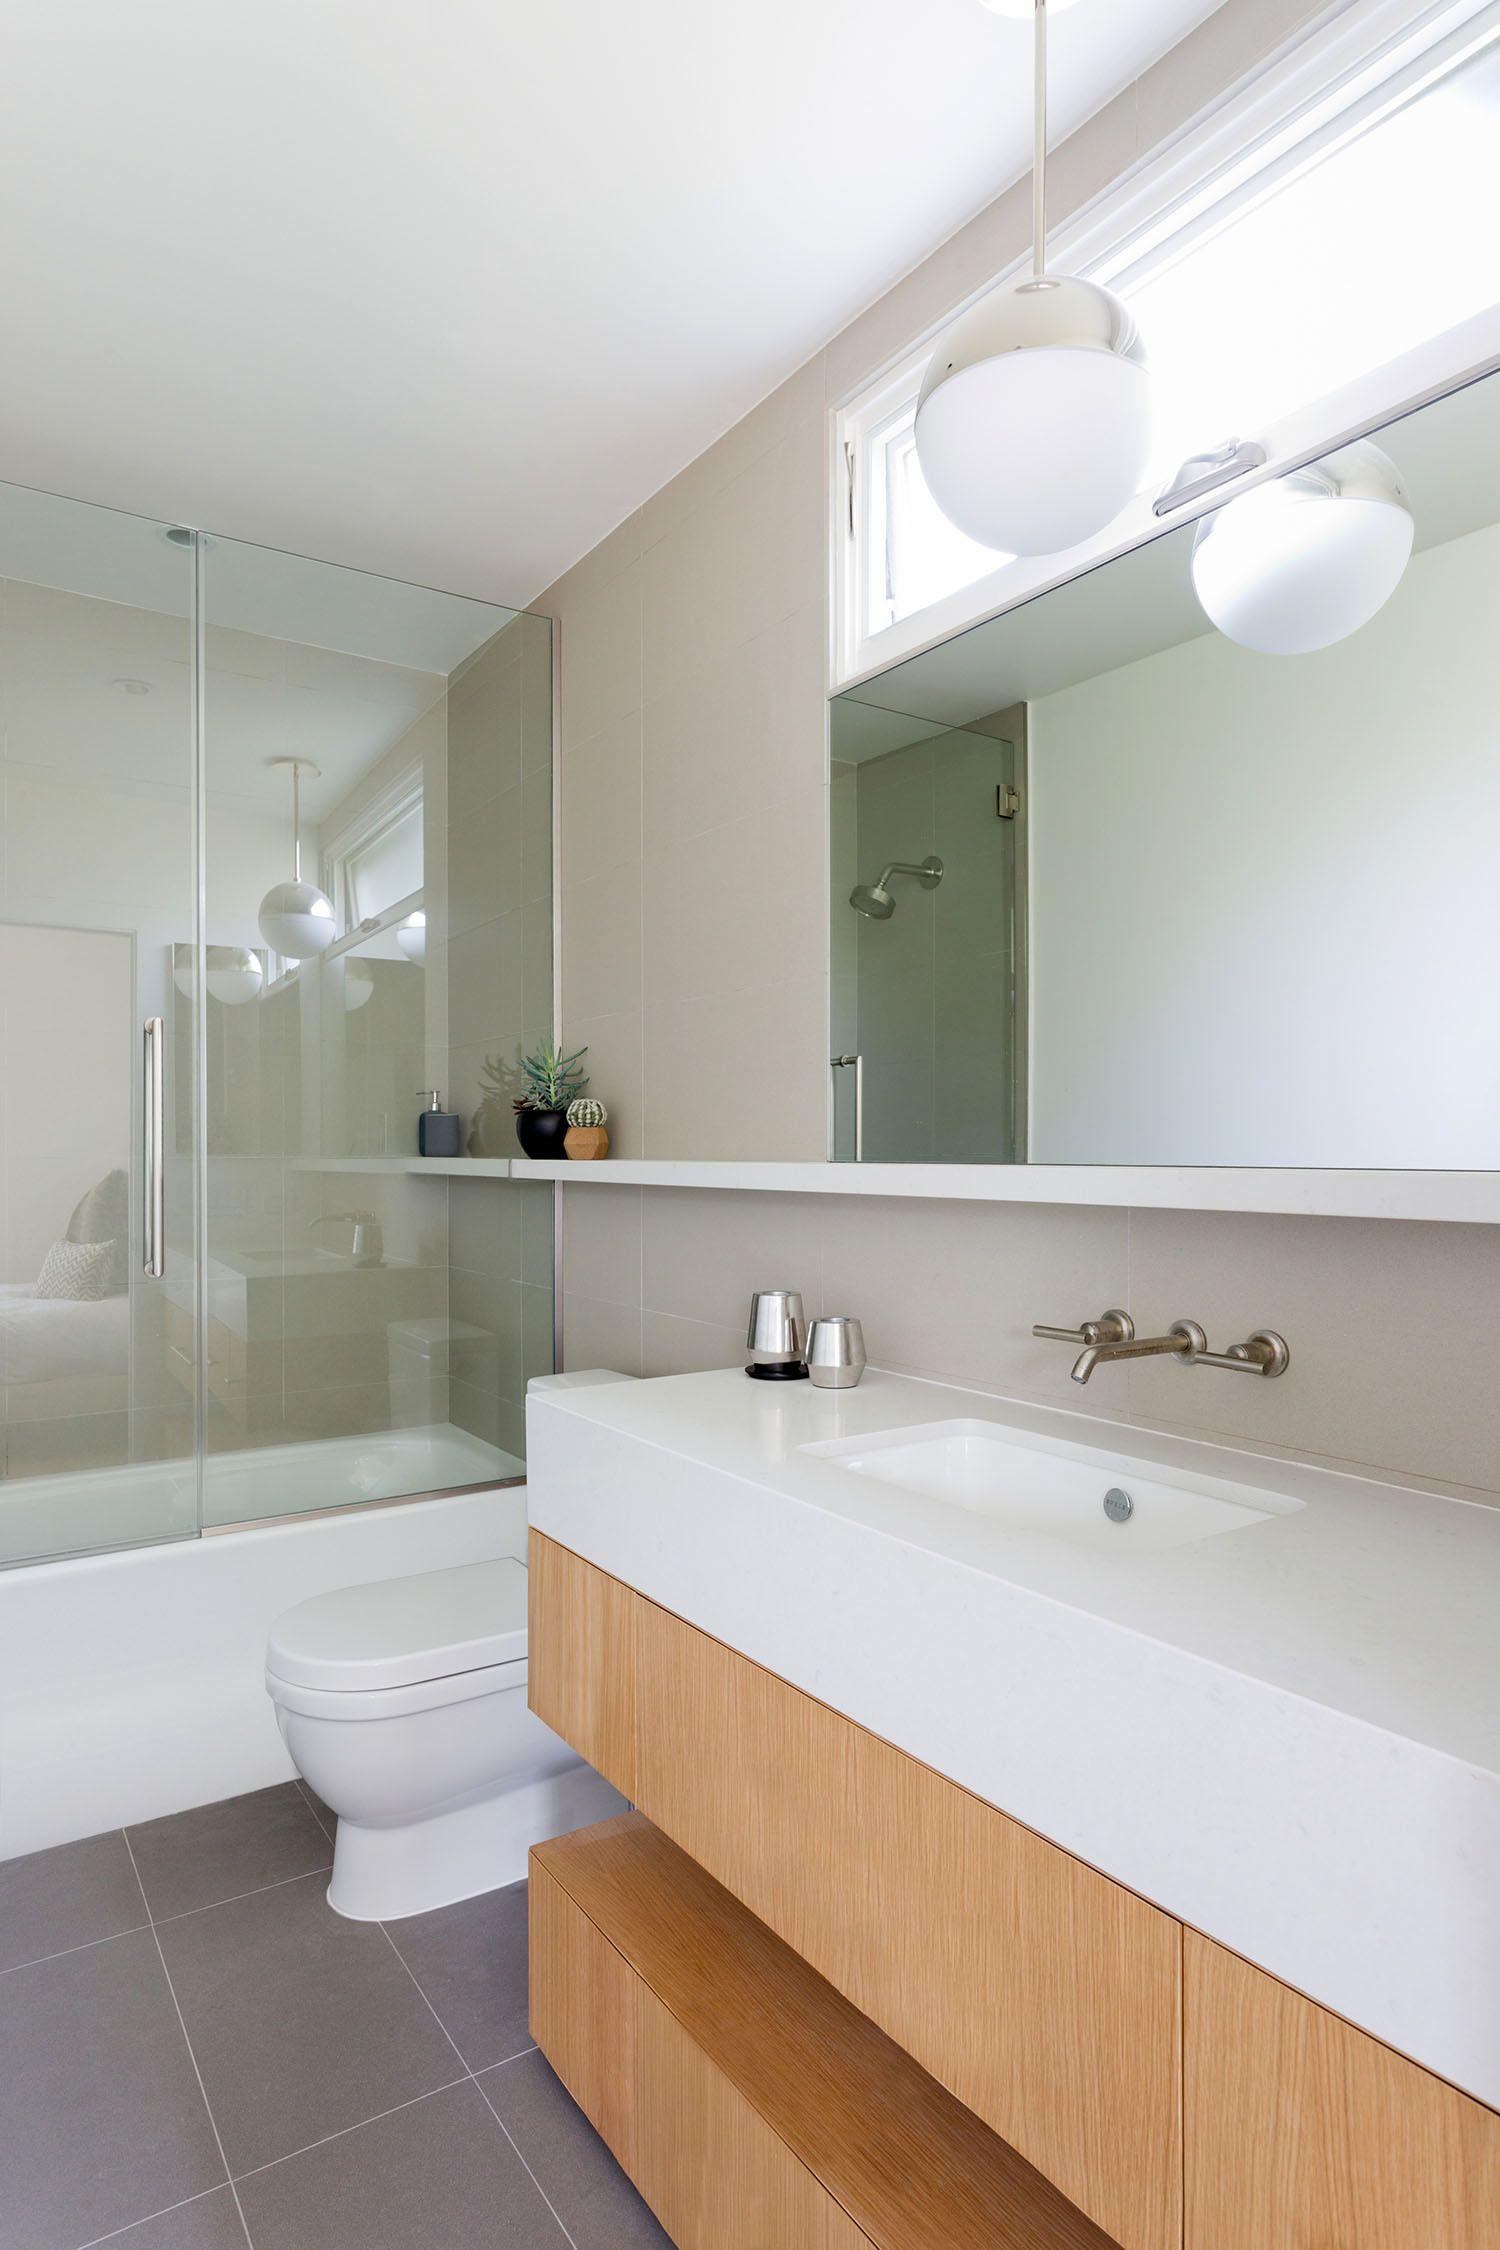 Del rey residence by hh design master bath vanity bath vanities